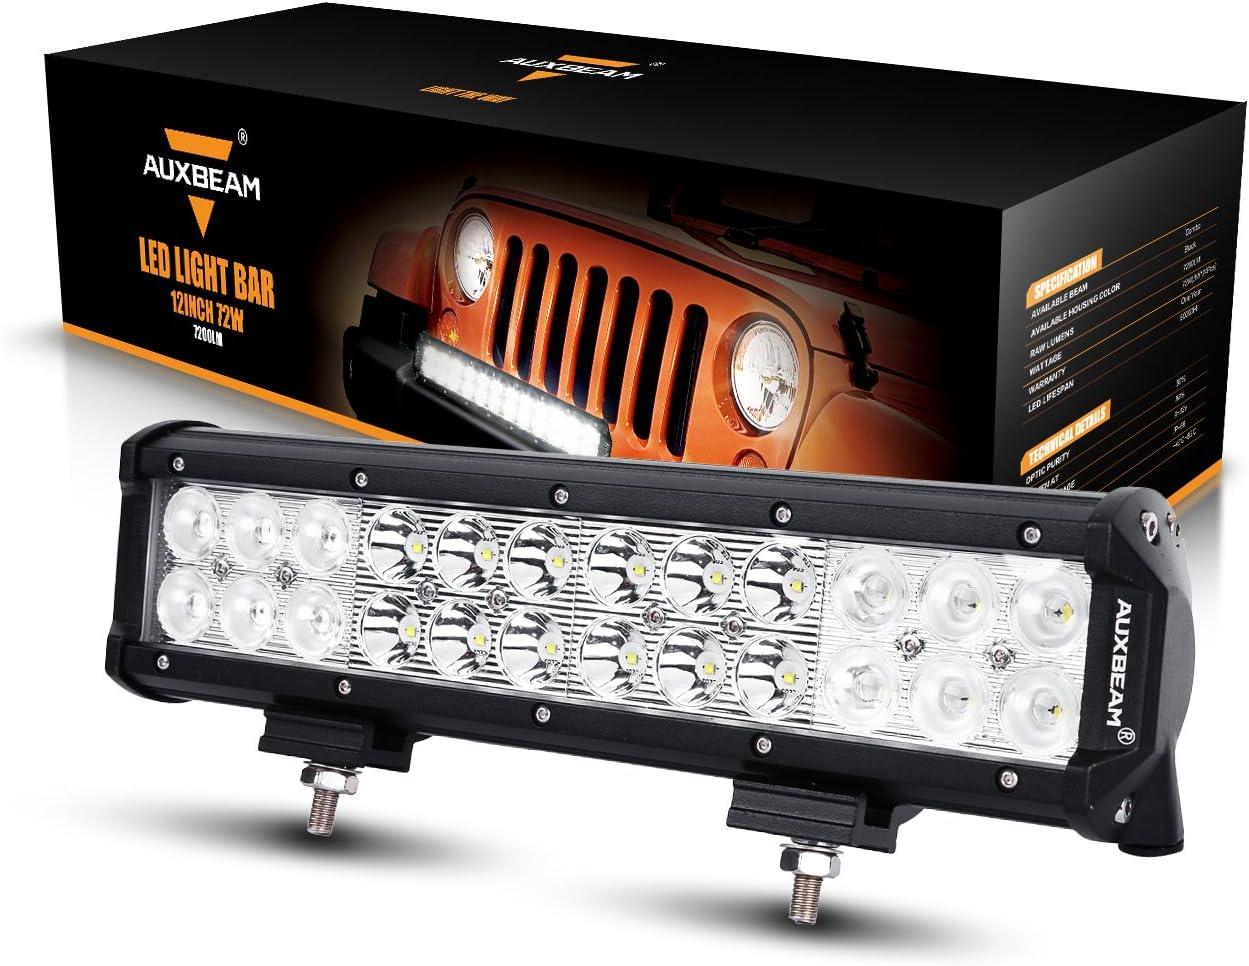 Auxbeam 12-Inch LED Light Bar